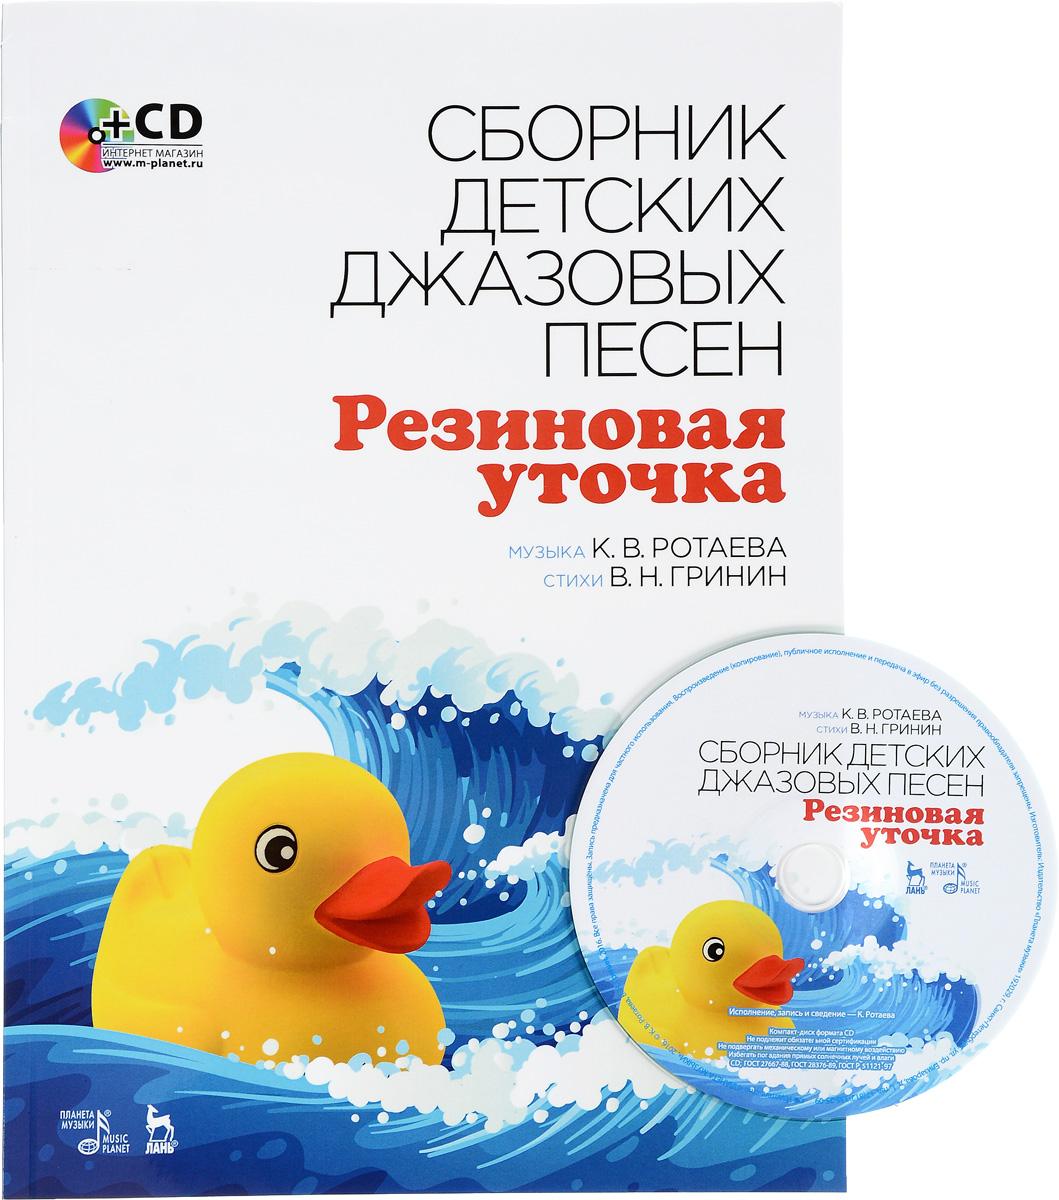 Collection of Children's Jazz Songs Rubber Duck: Textbook / Сборник детских джазовых песен Резиновая уточка (+ CD) тулетная вода vip club platinum 100ml vip club